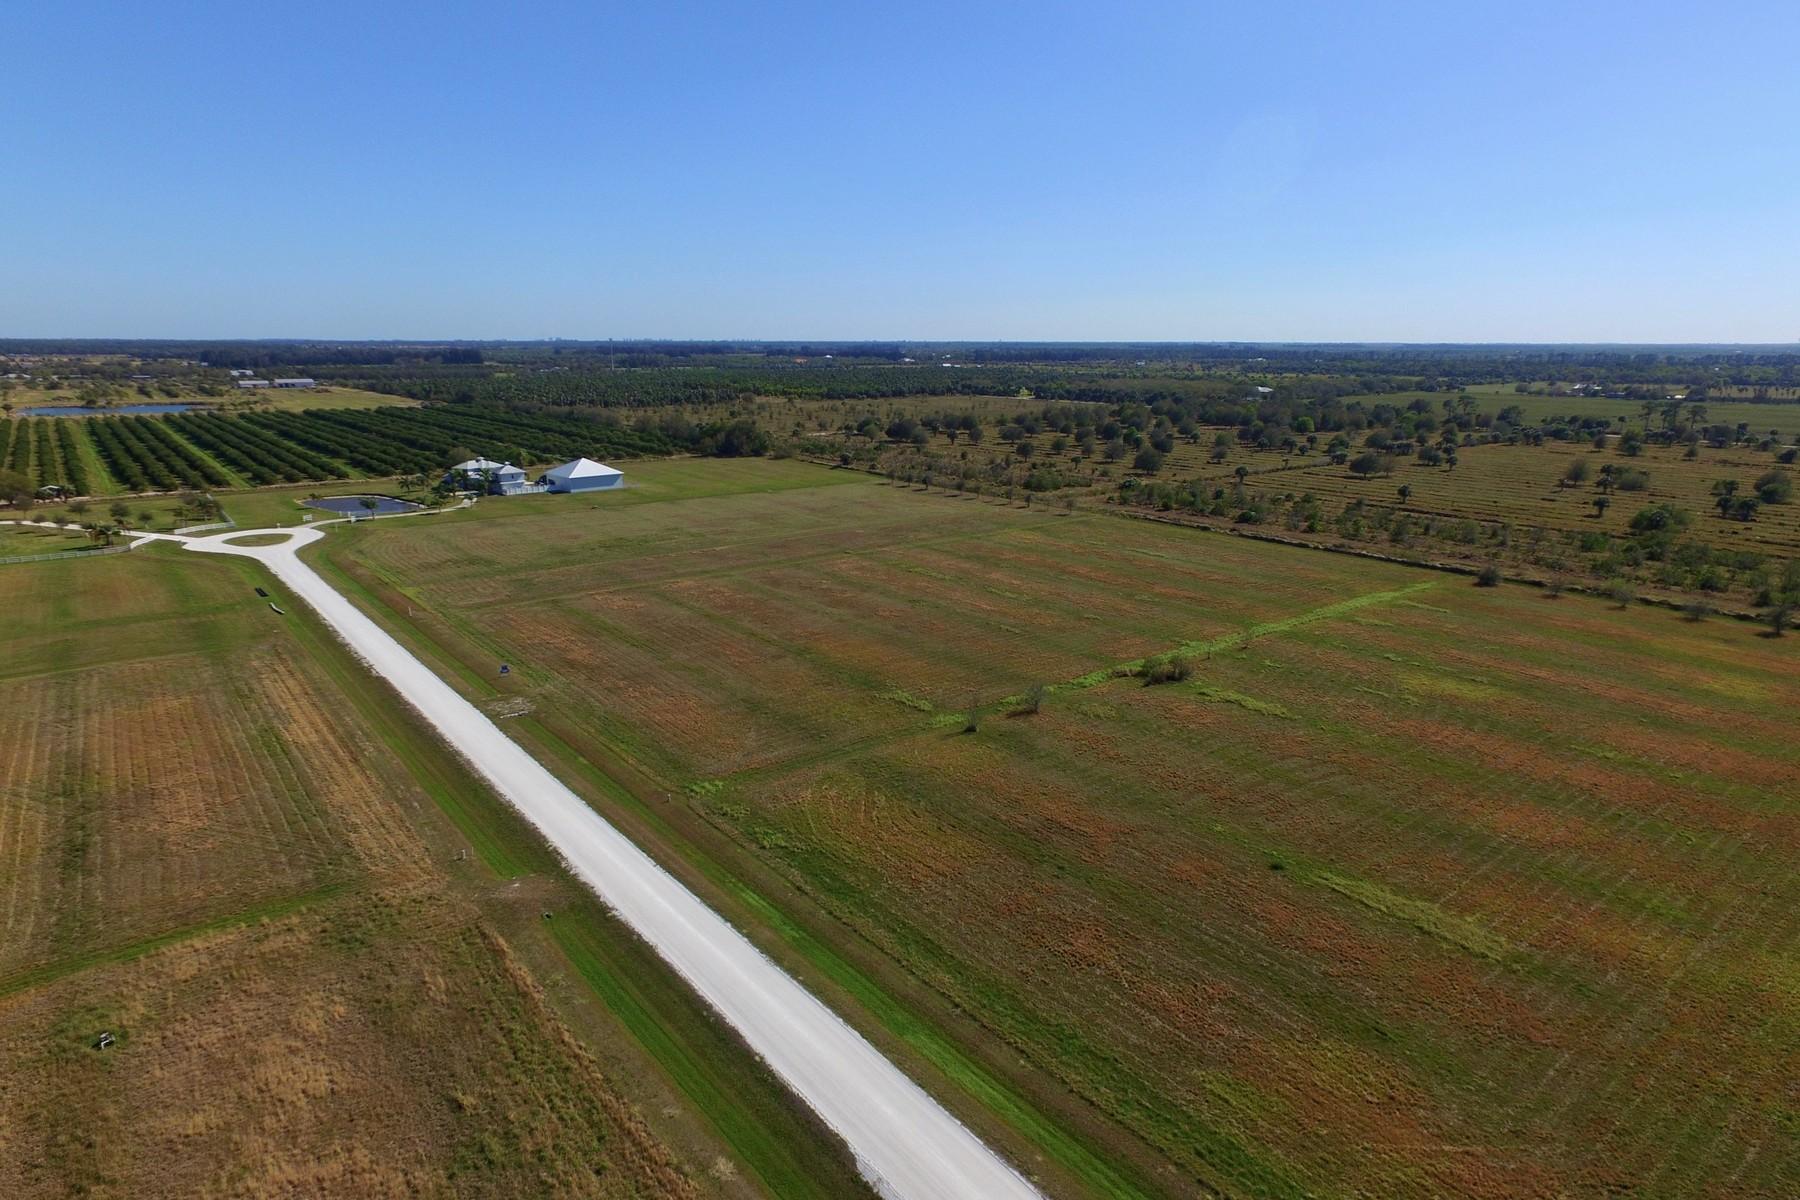 Land for Sale at 5 Acre Homesite in Victoria Plantation 6505 Lily Lane Vero Beach, Florida, 32968 United States